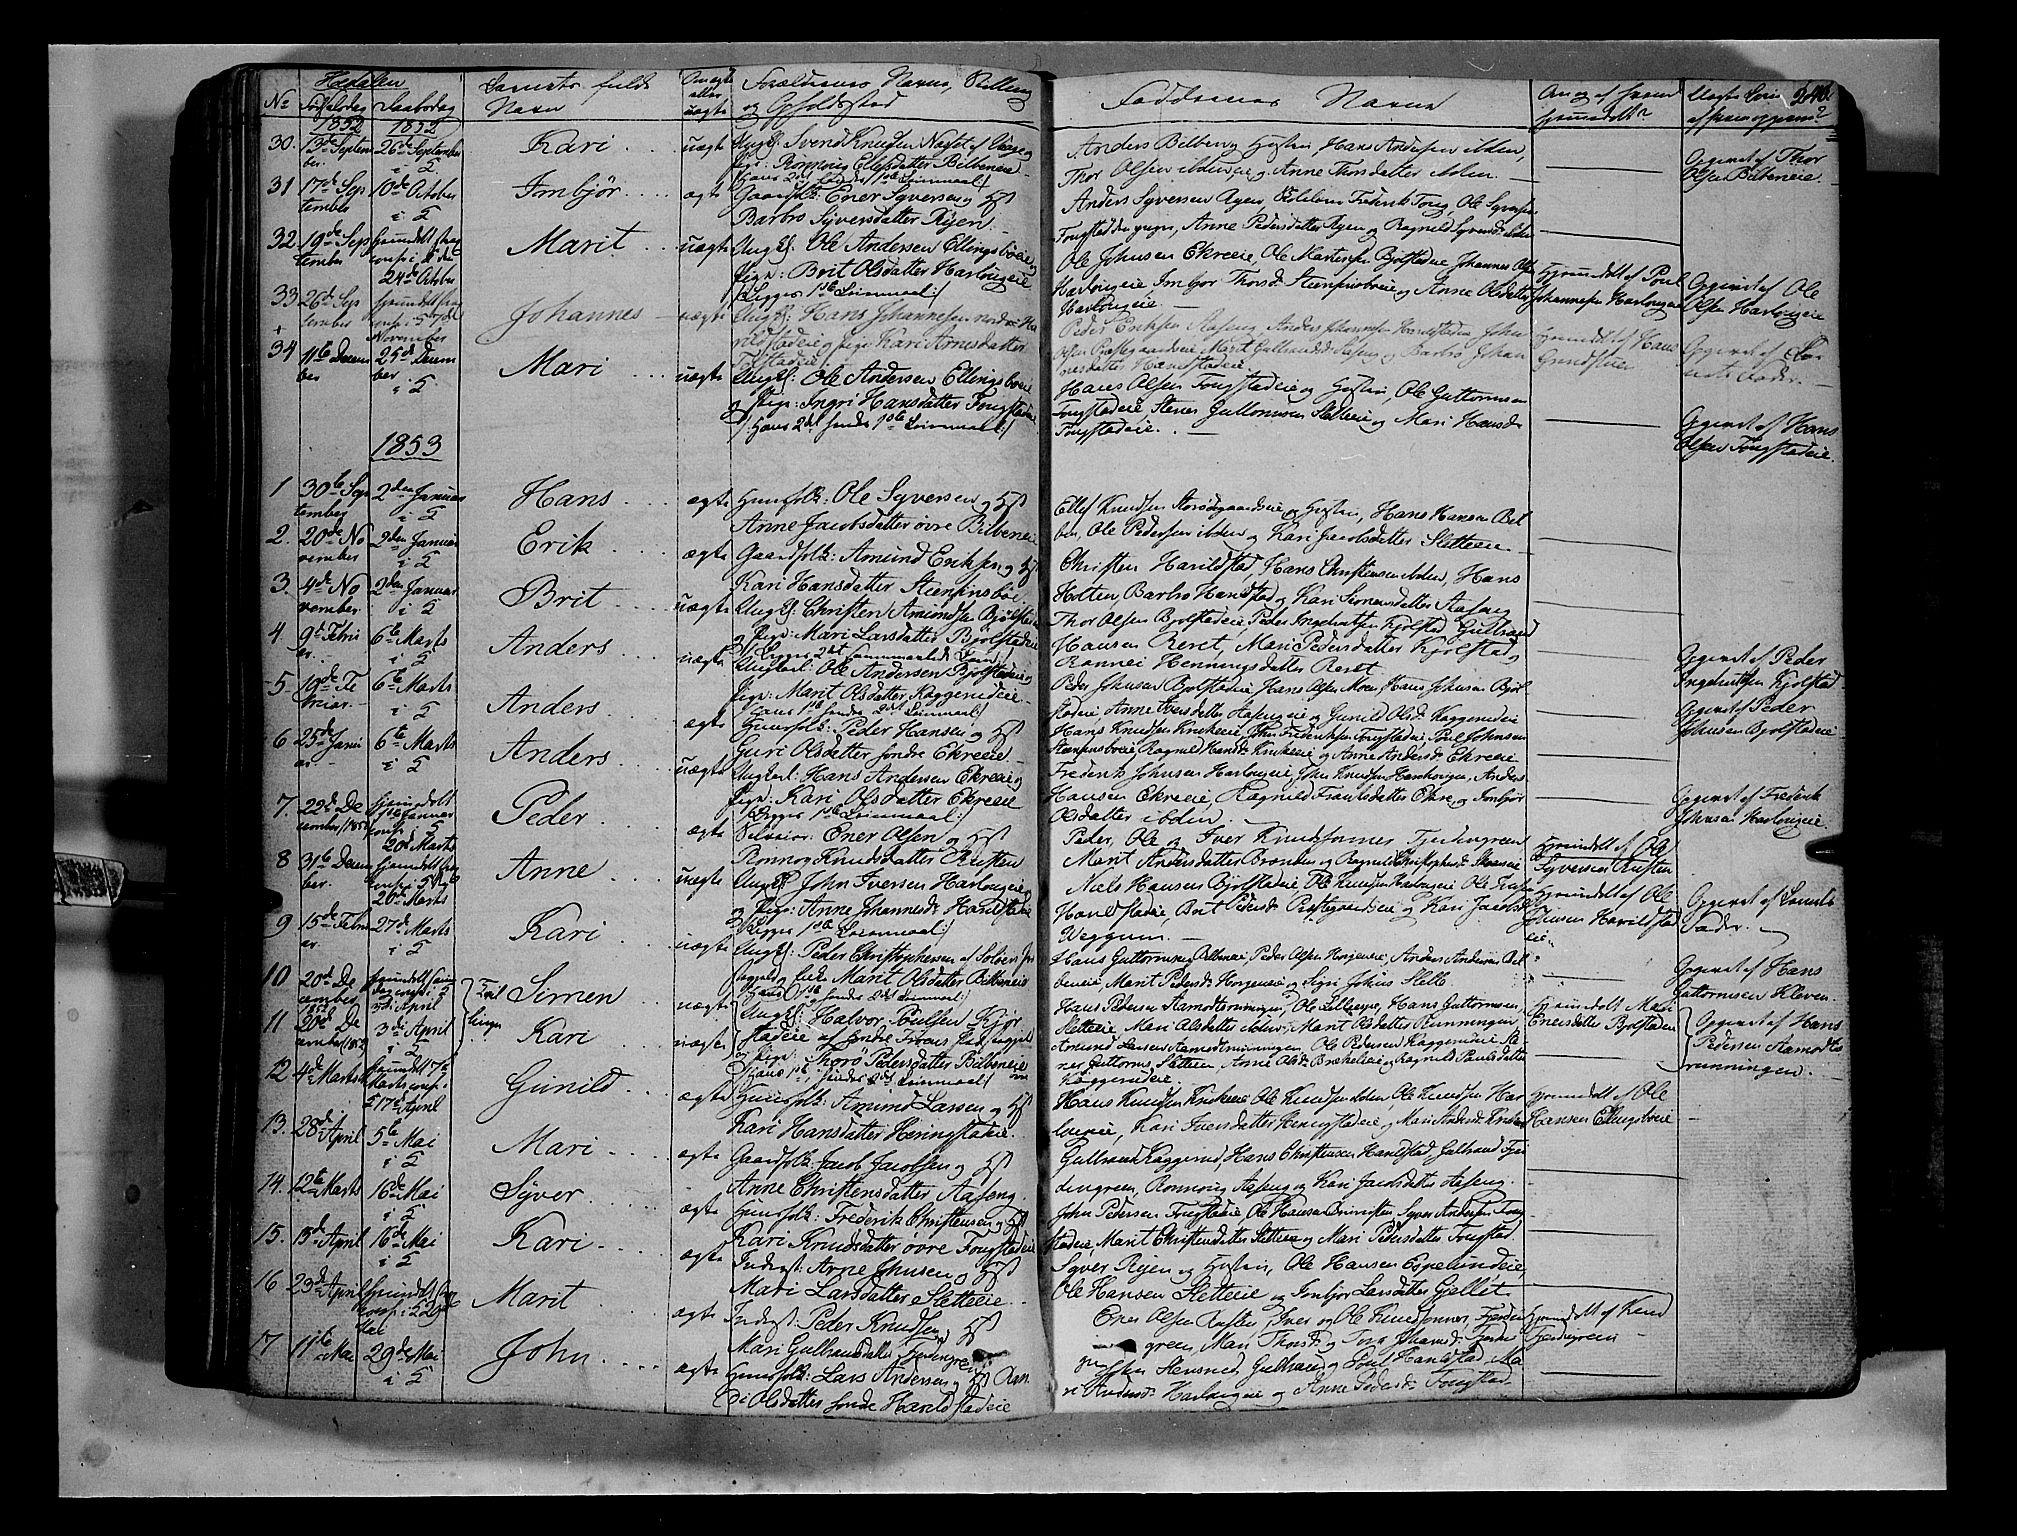 SAH, Vågå prestekontor, Ministerialbok nr. 5 /2, 1842-1856, s. 240